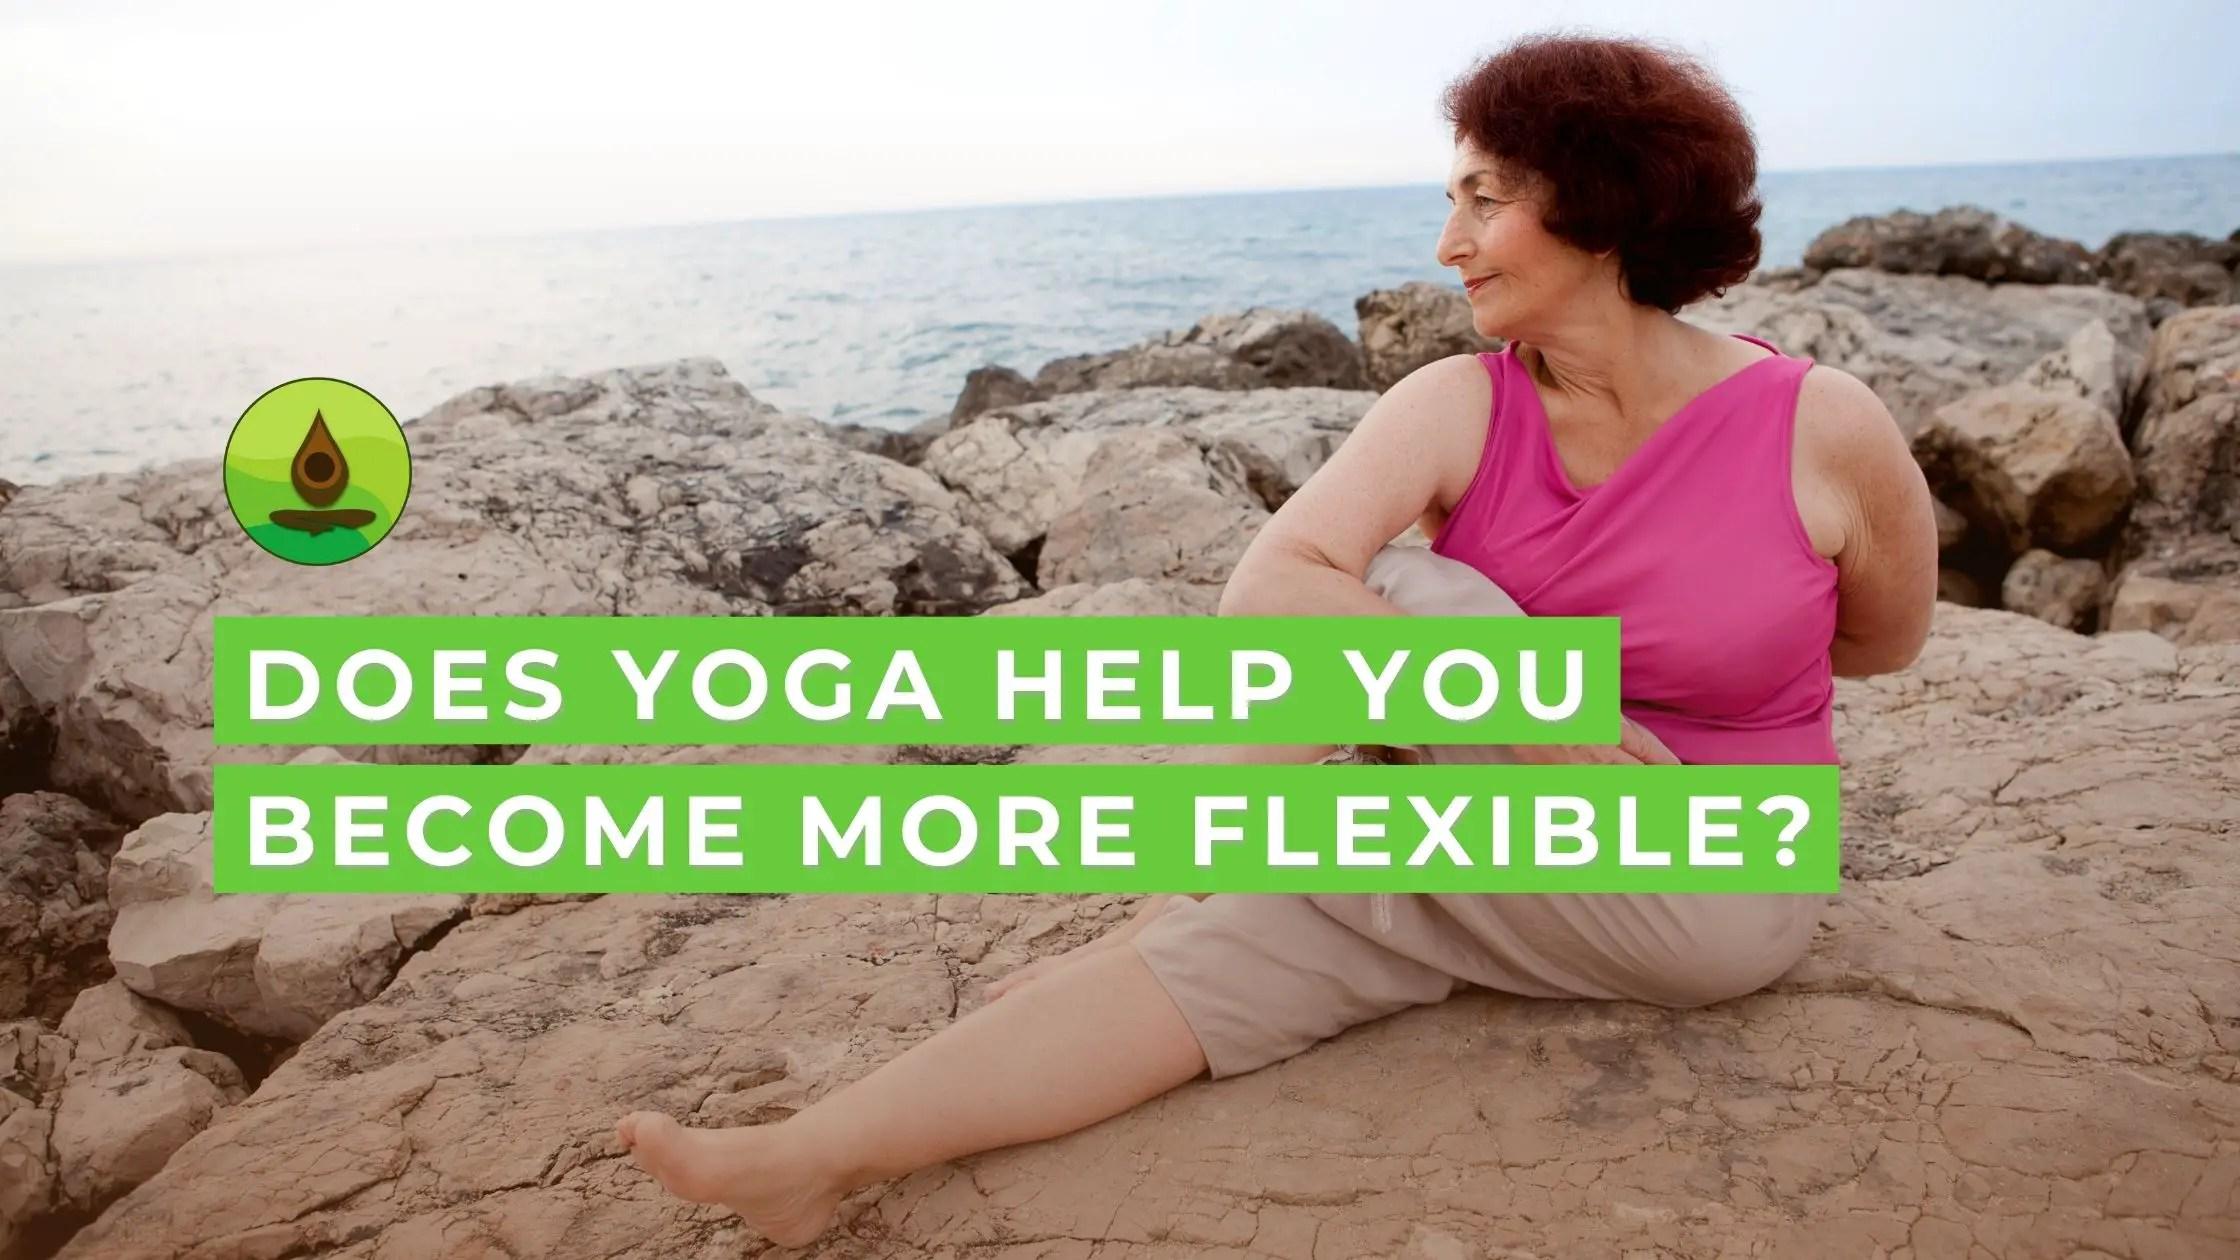 Yoga Flexible